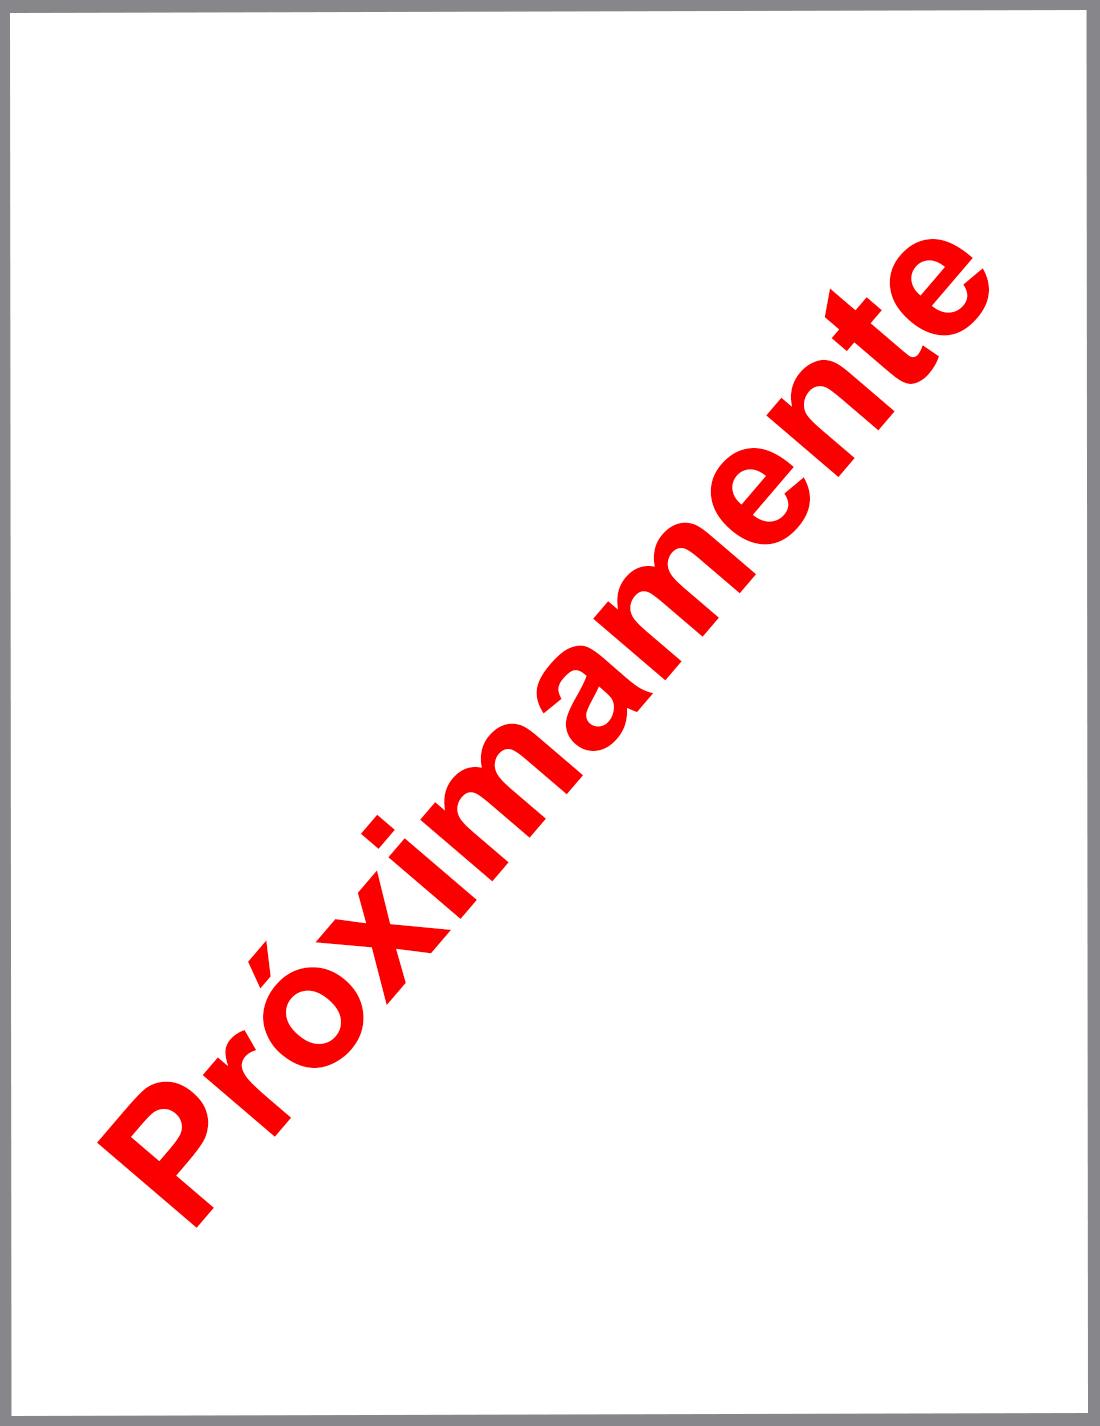 proximamente_revista_primera_epoca